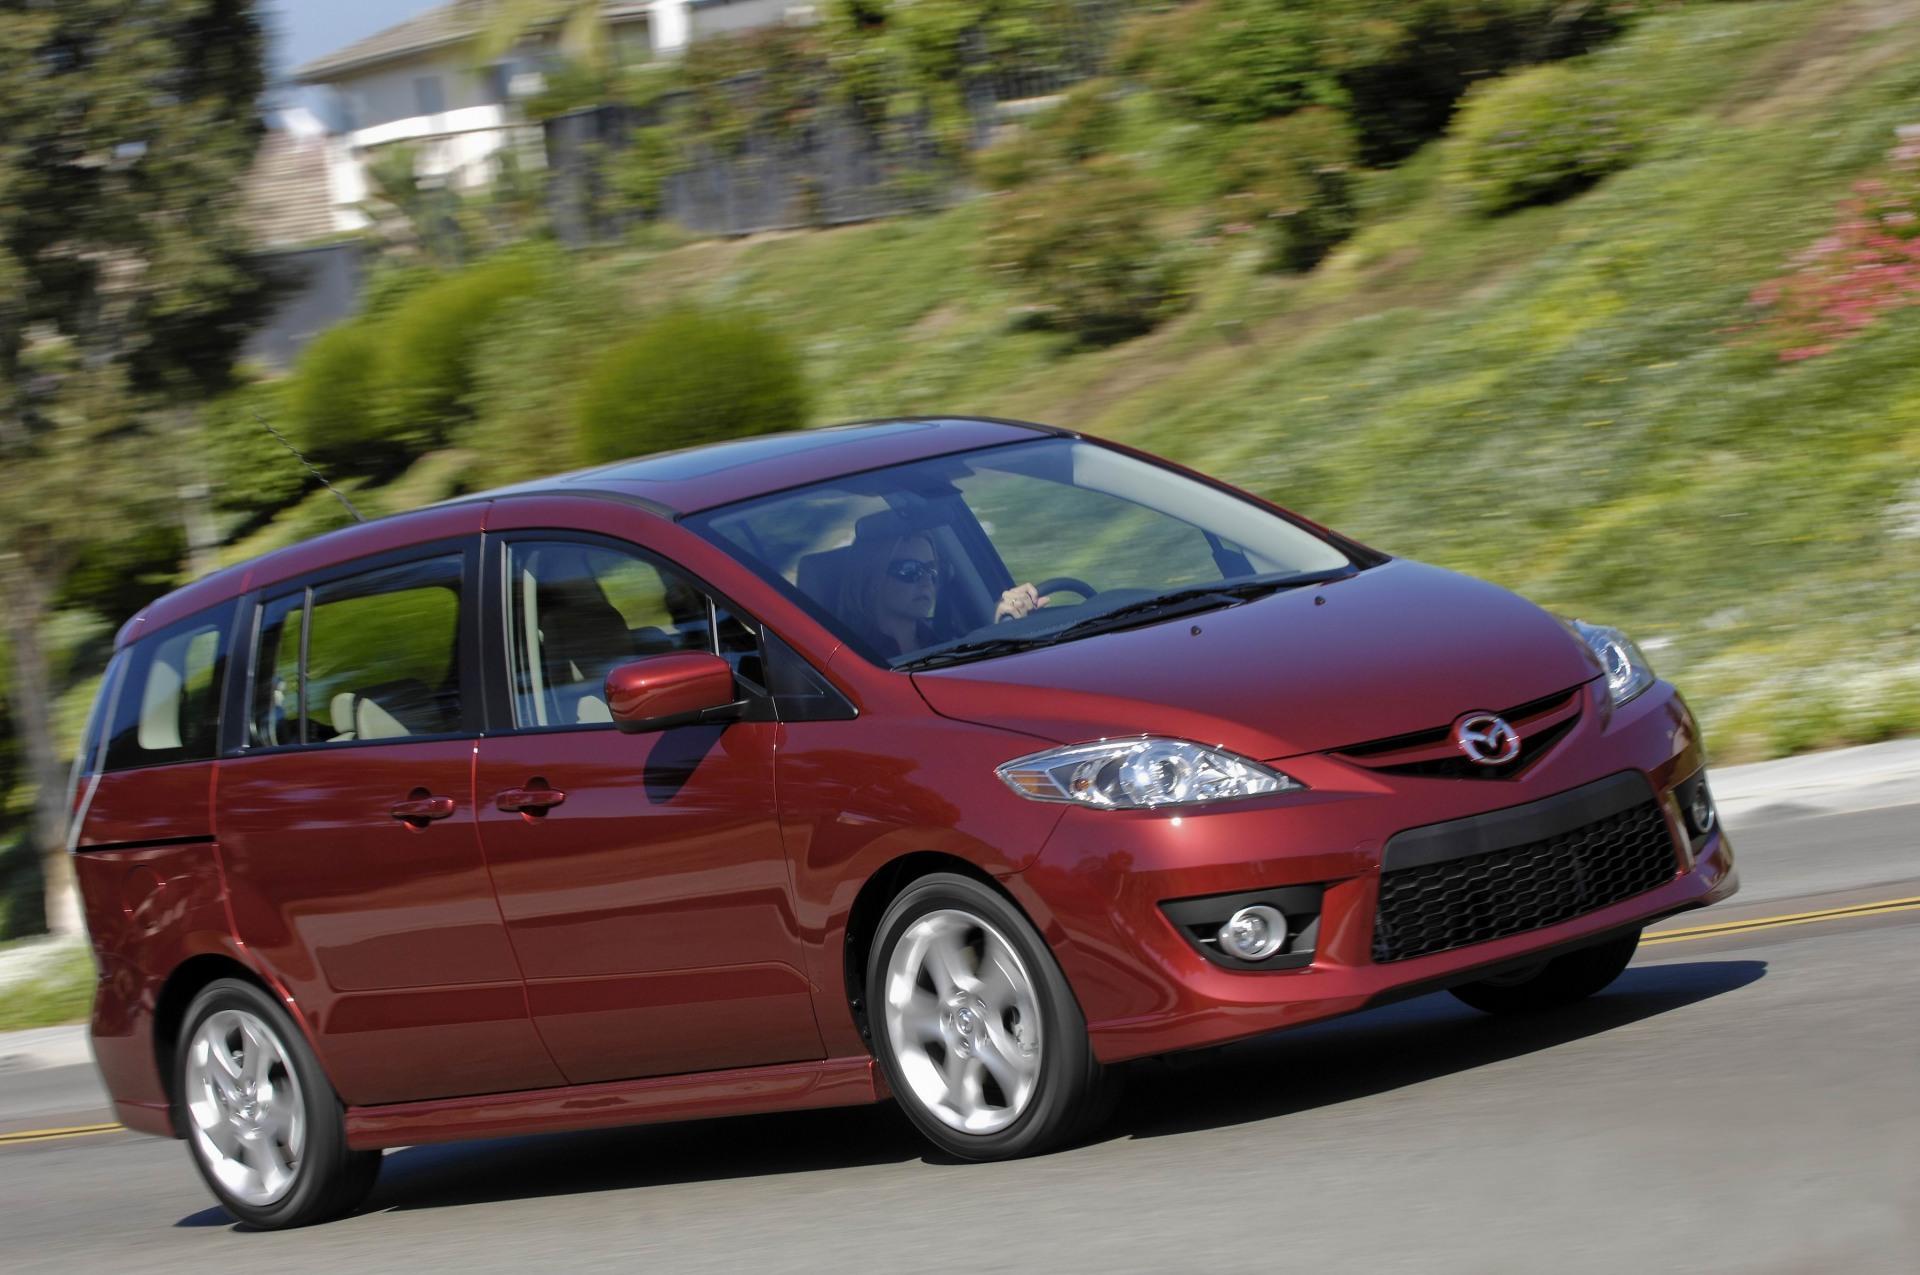 2010 Mazda 5 News And Information  Conceptcarzcom